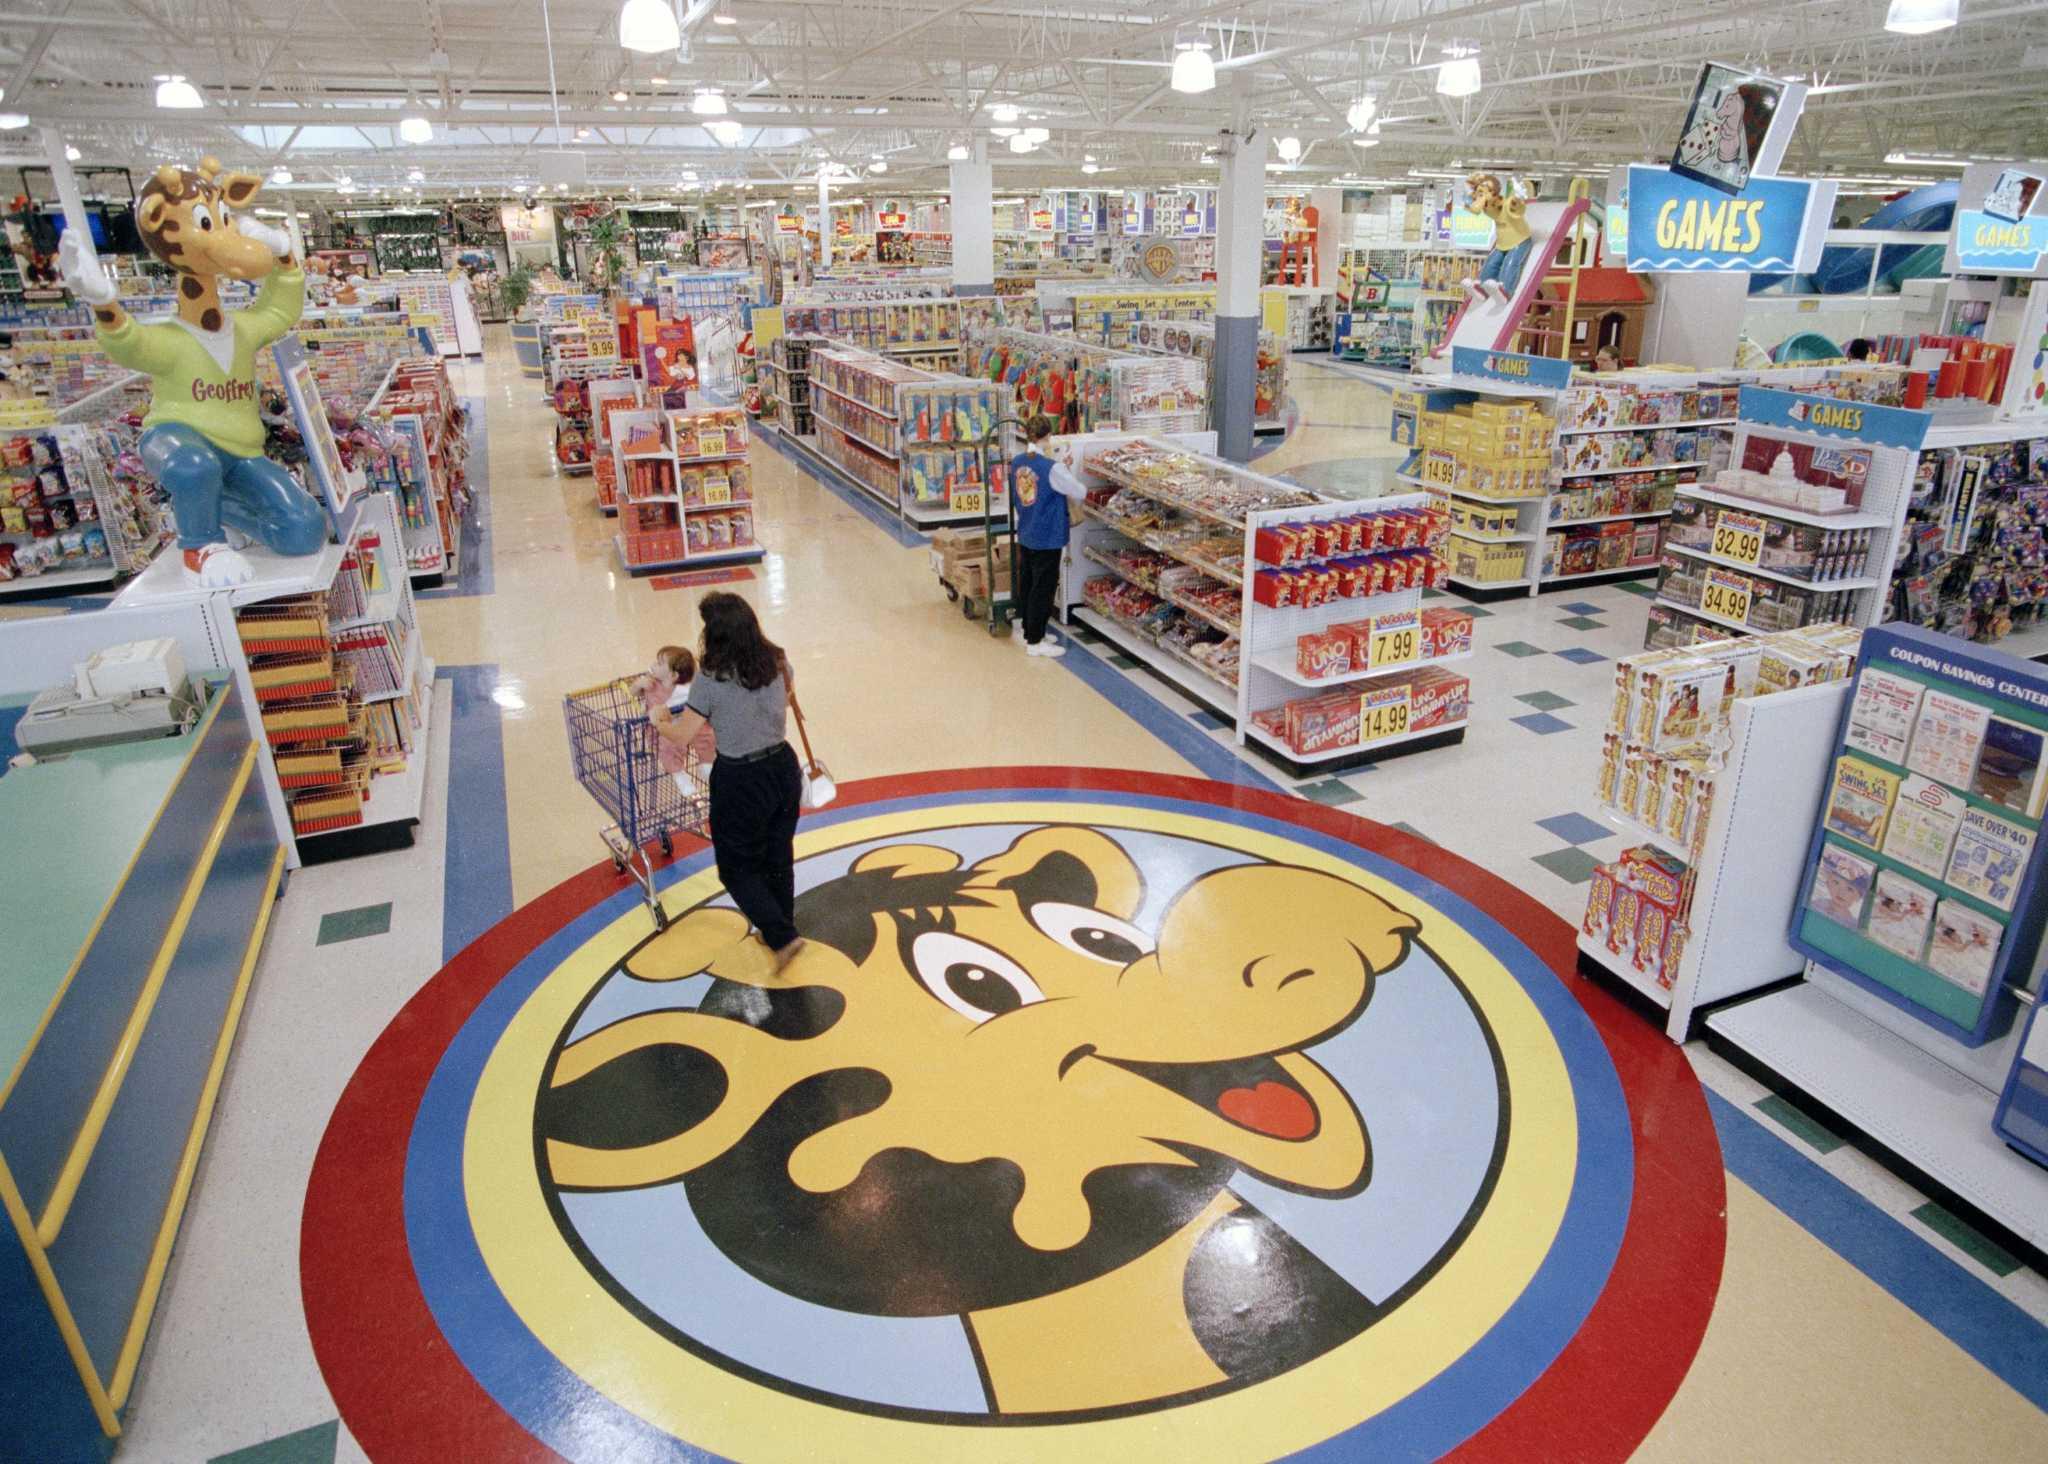 a2fa8bc173830 Billionaire toy executive hopes to raise $800 million via crowdfunding to  save Toys R Us